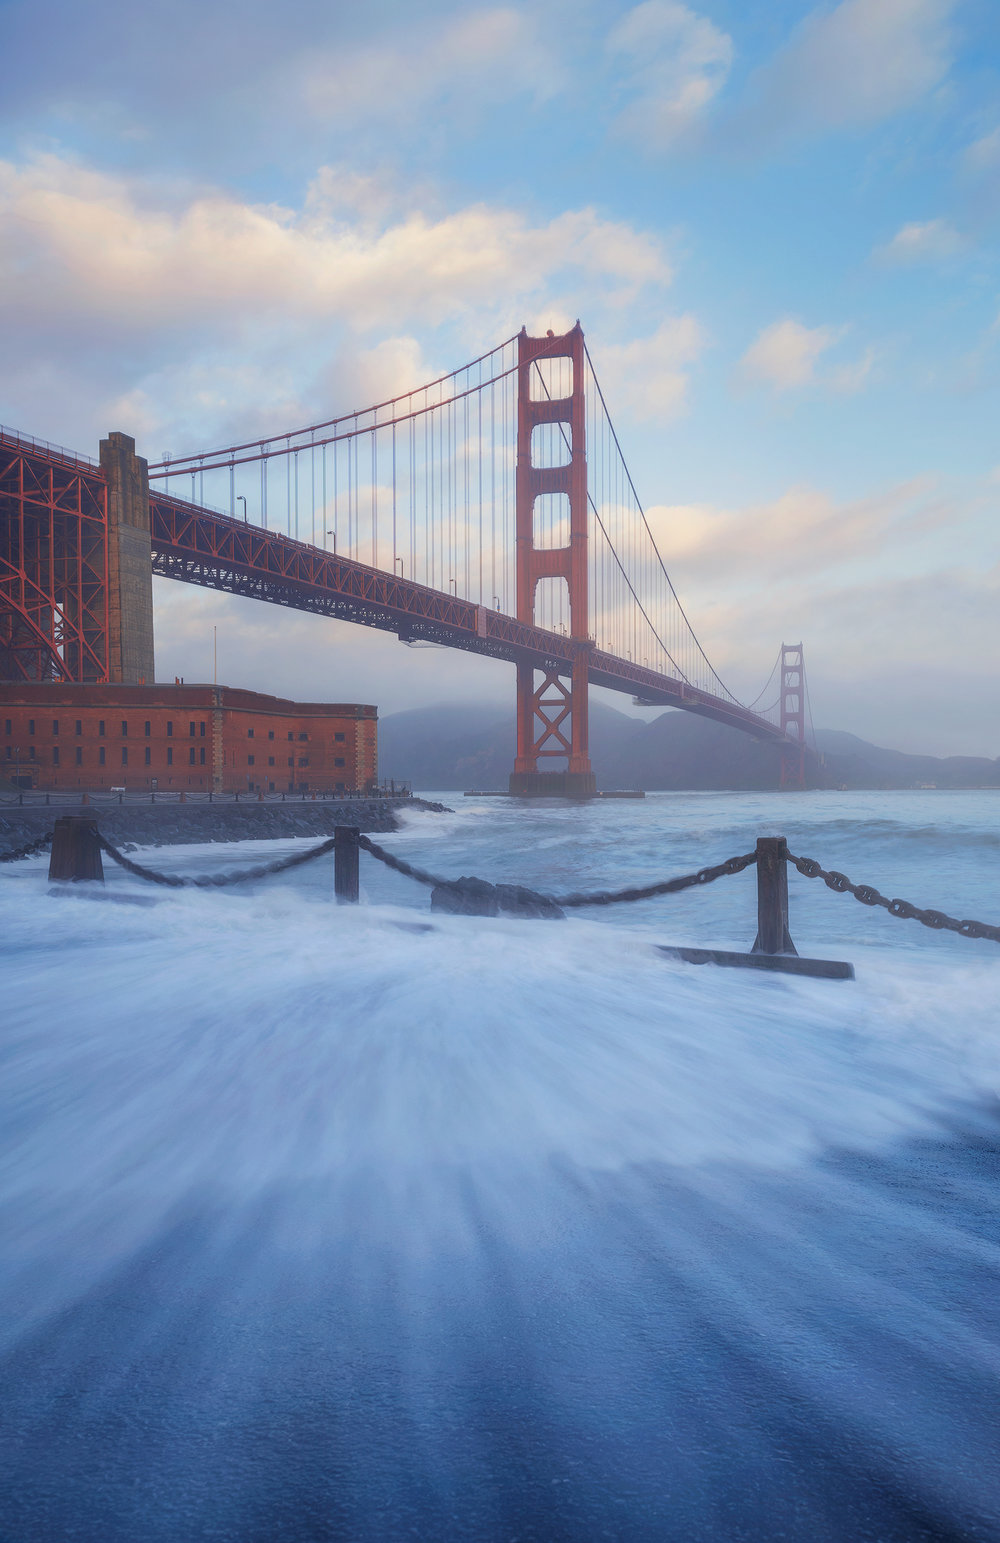 San_Francisco_TER2226.jpg